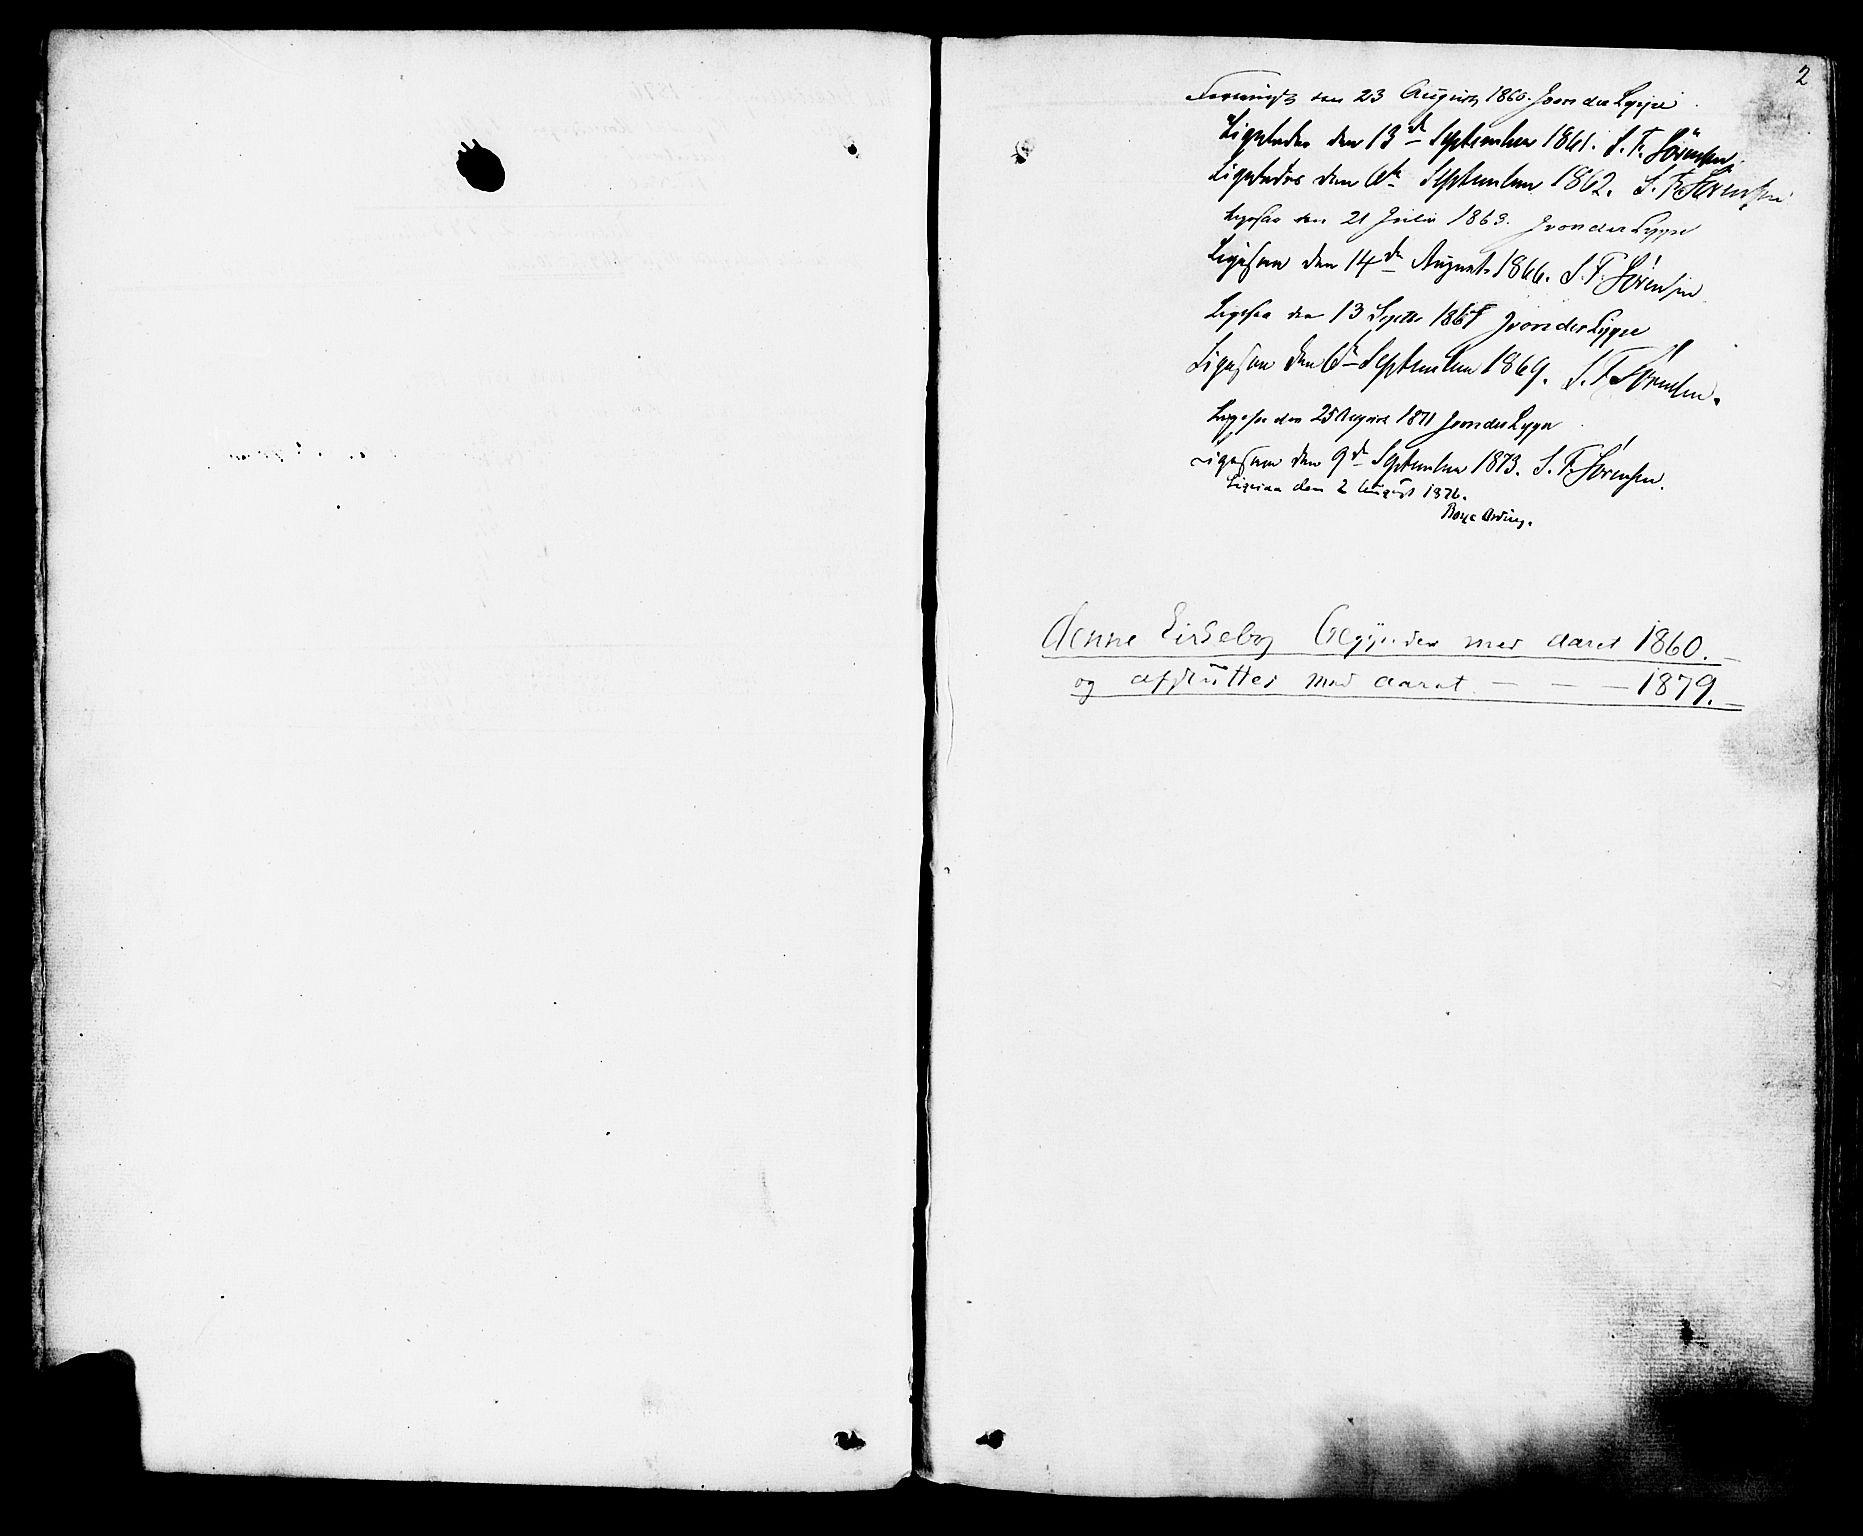 SAKO, Hjartdal kirkebøker, F/Fa/L0009: Ministerialbok nr. I 9, 1860-1879, s. 2